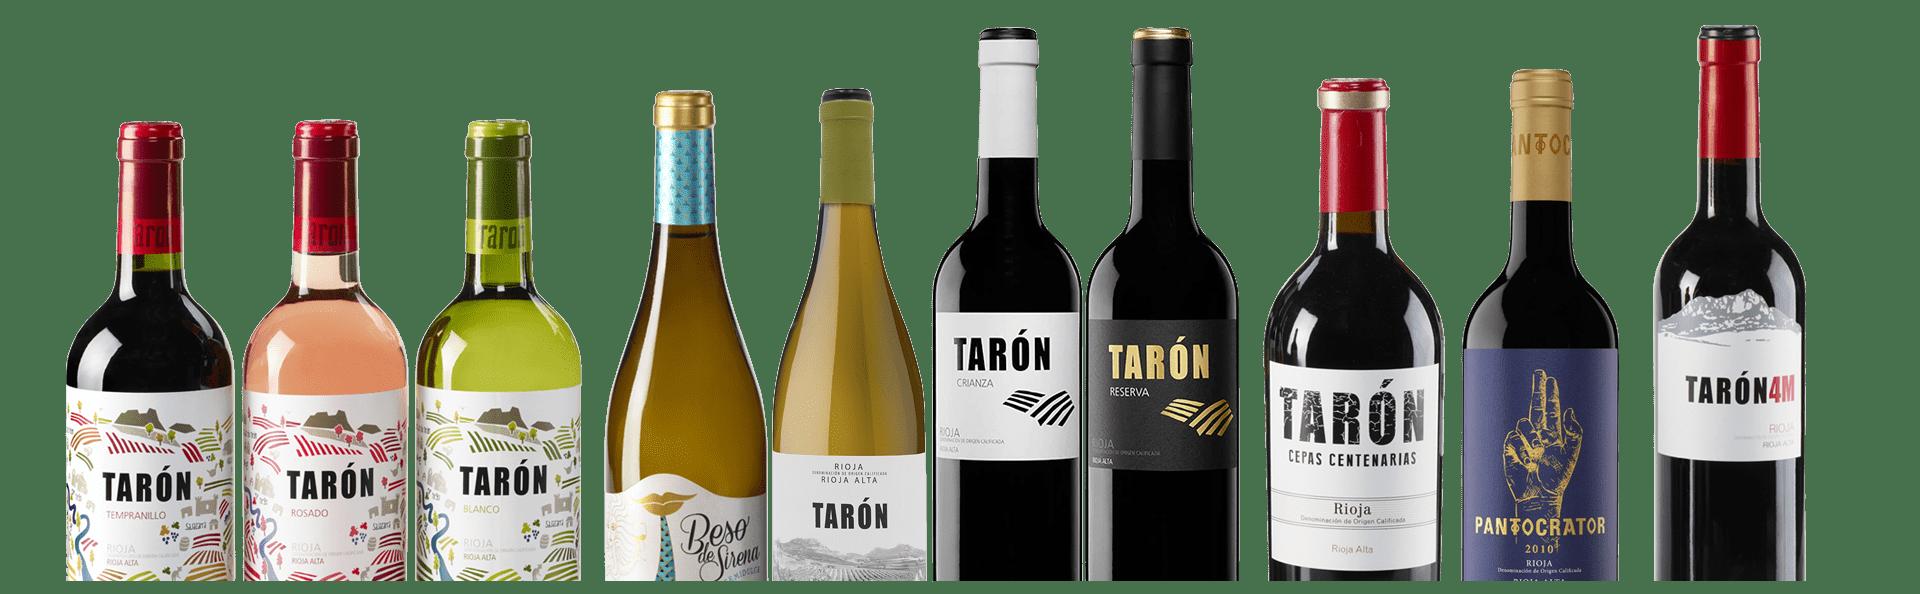 bodegas-taron-vinos-bodegon-completo-02-4